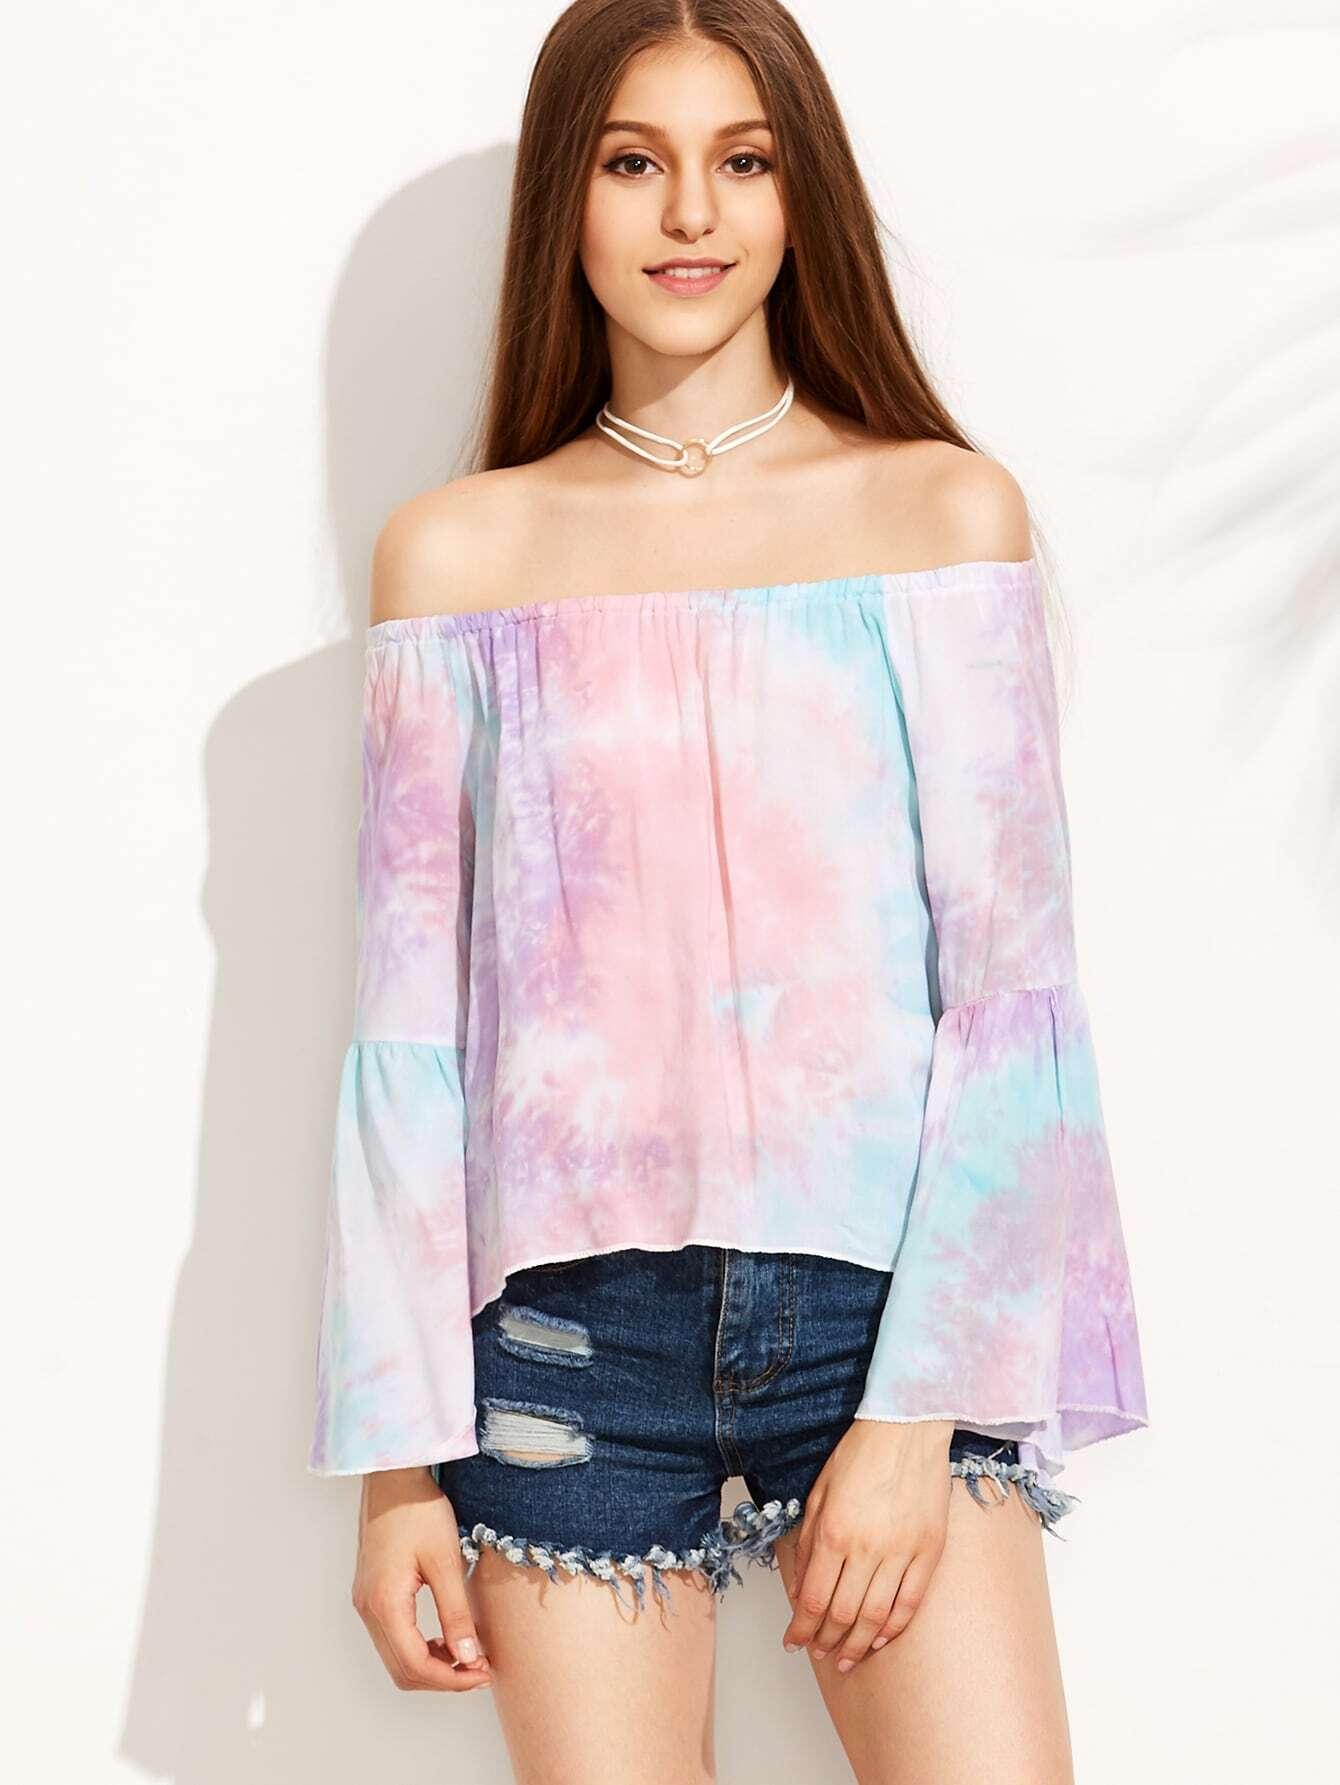 blouse160802003_2